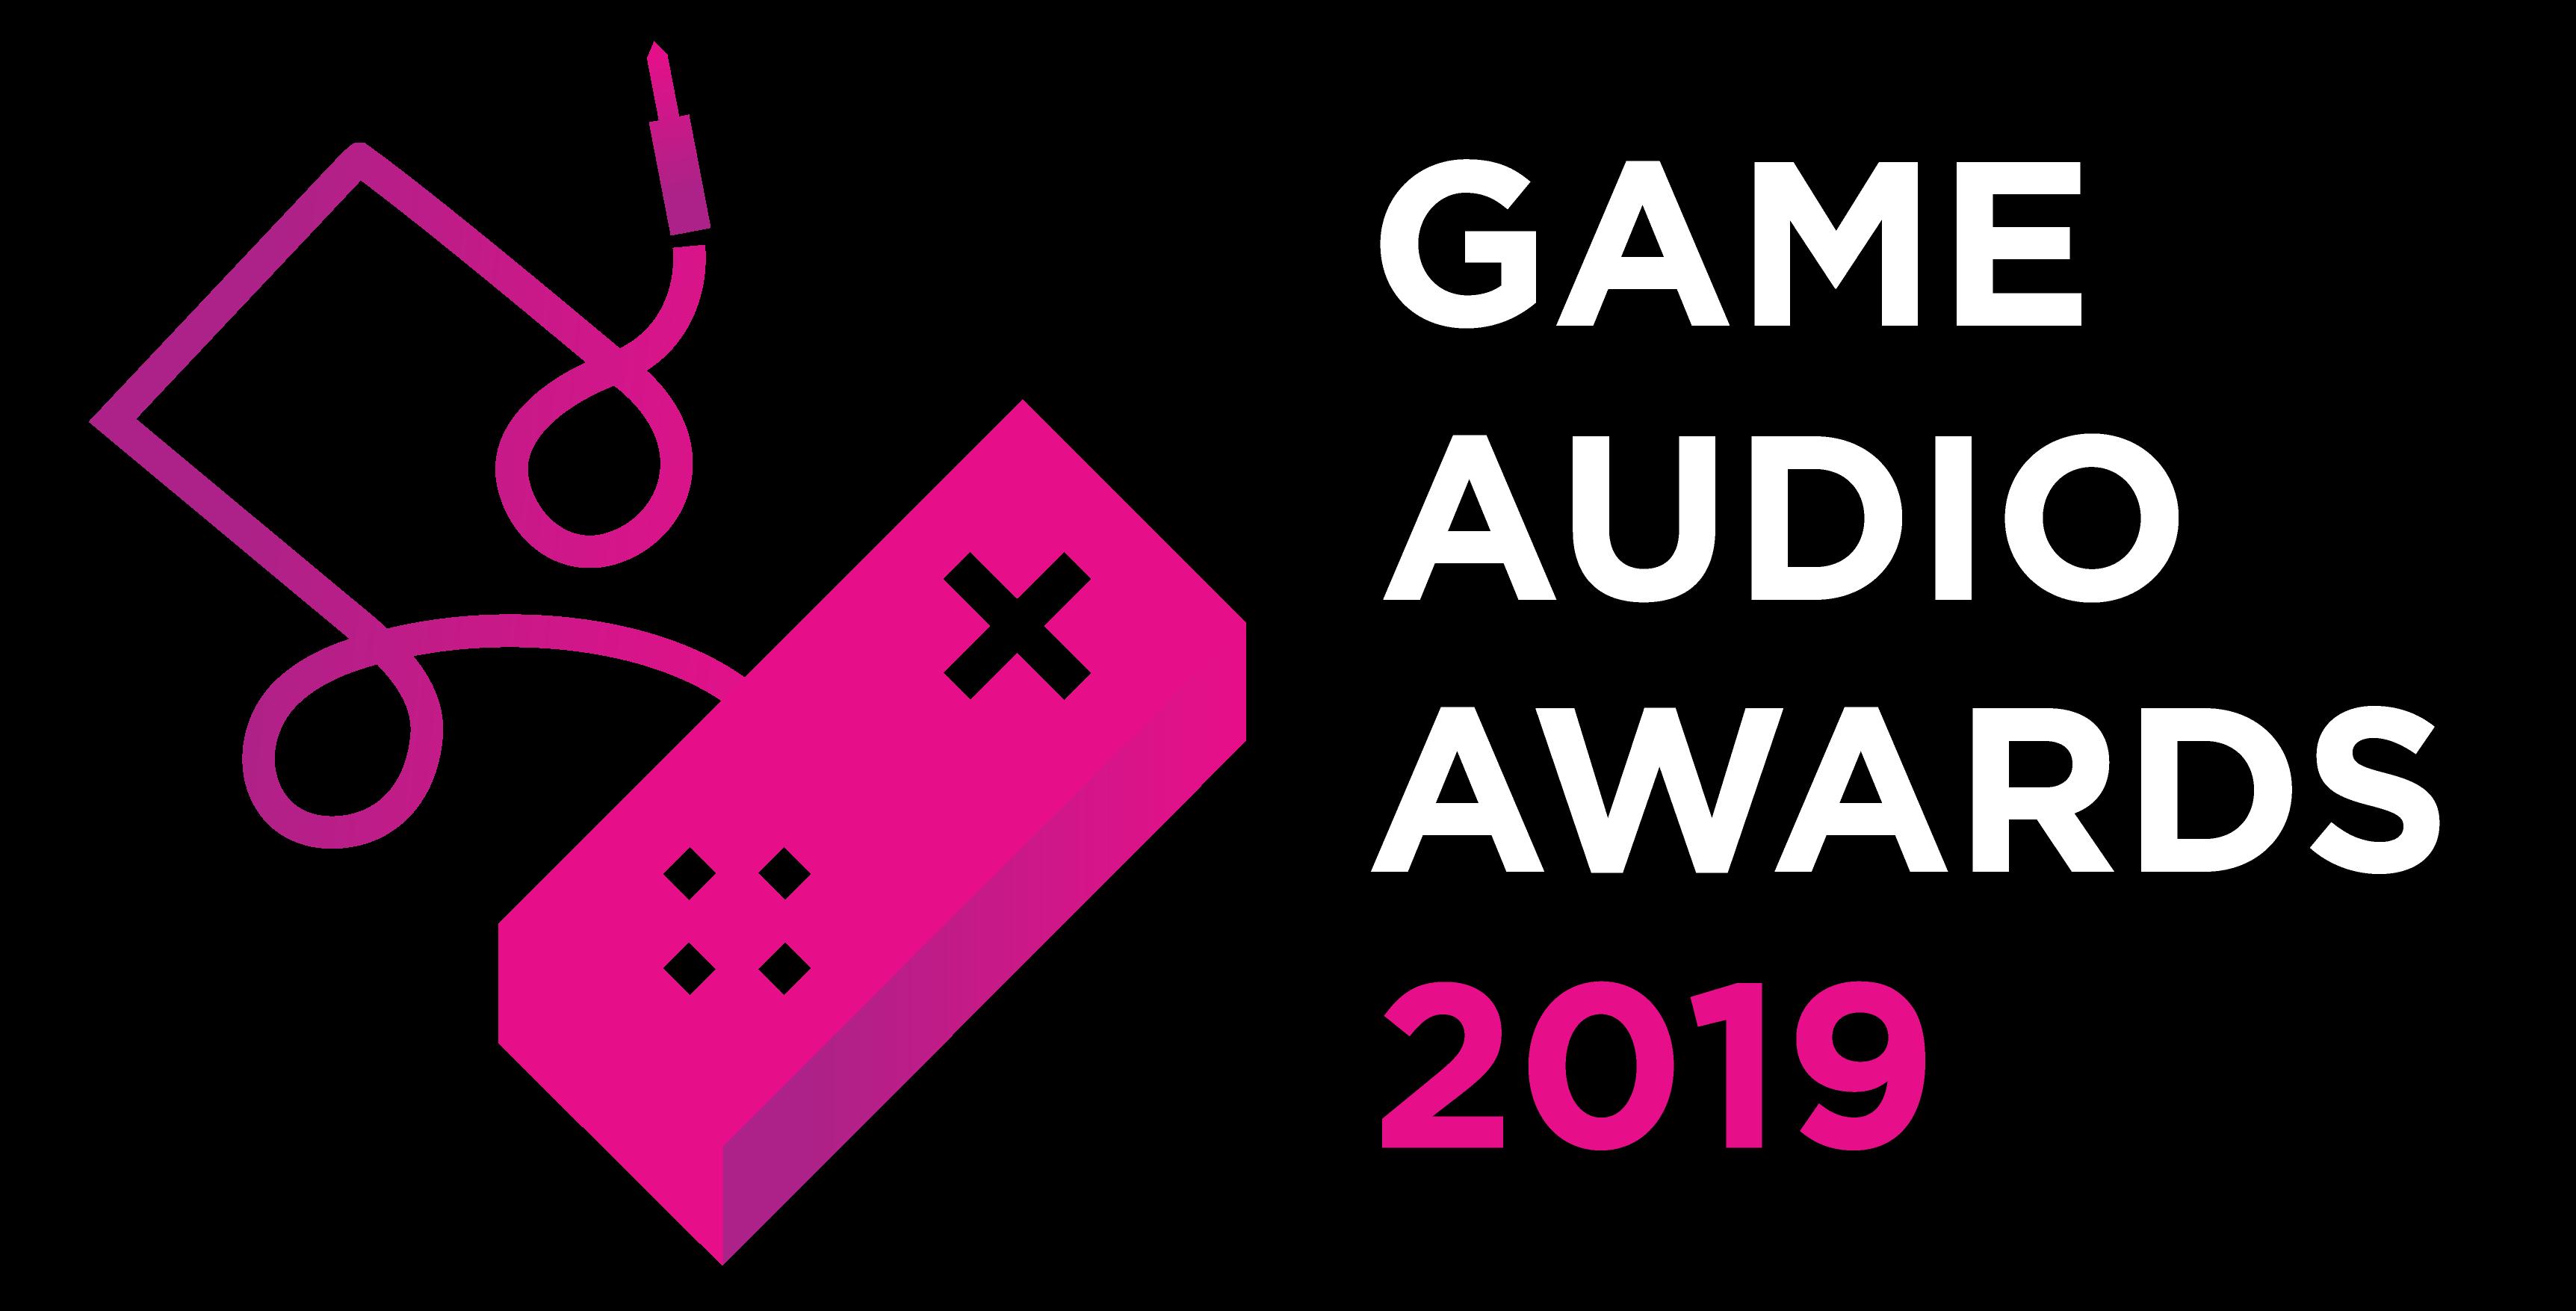 Game Audio Awards